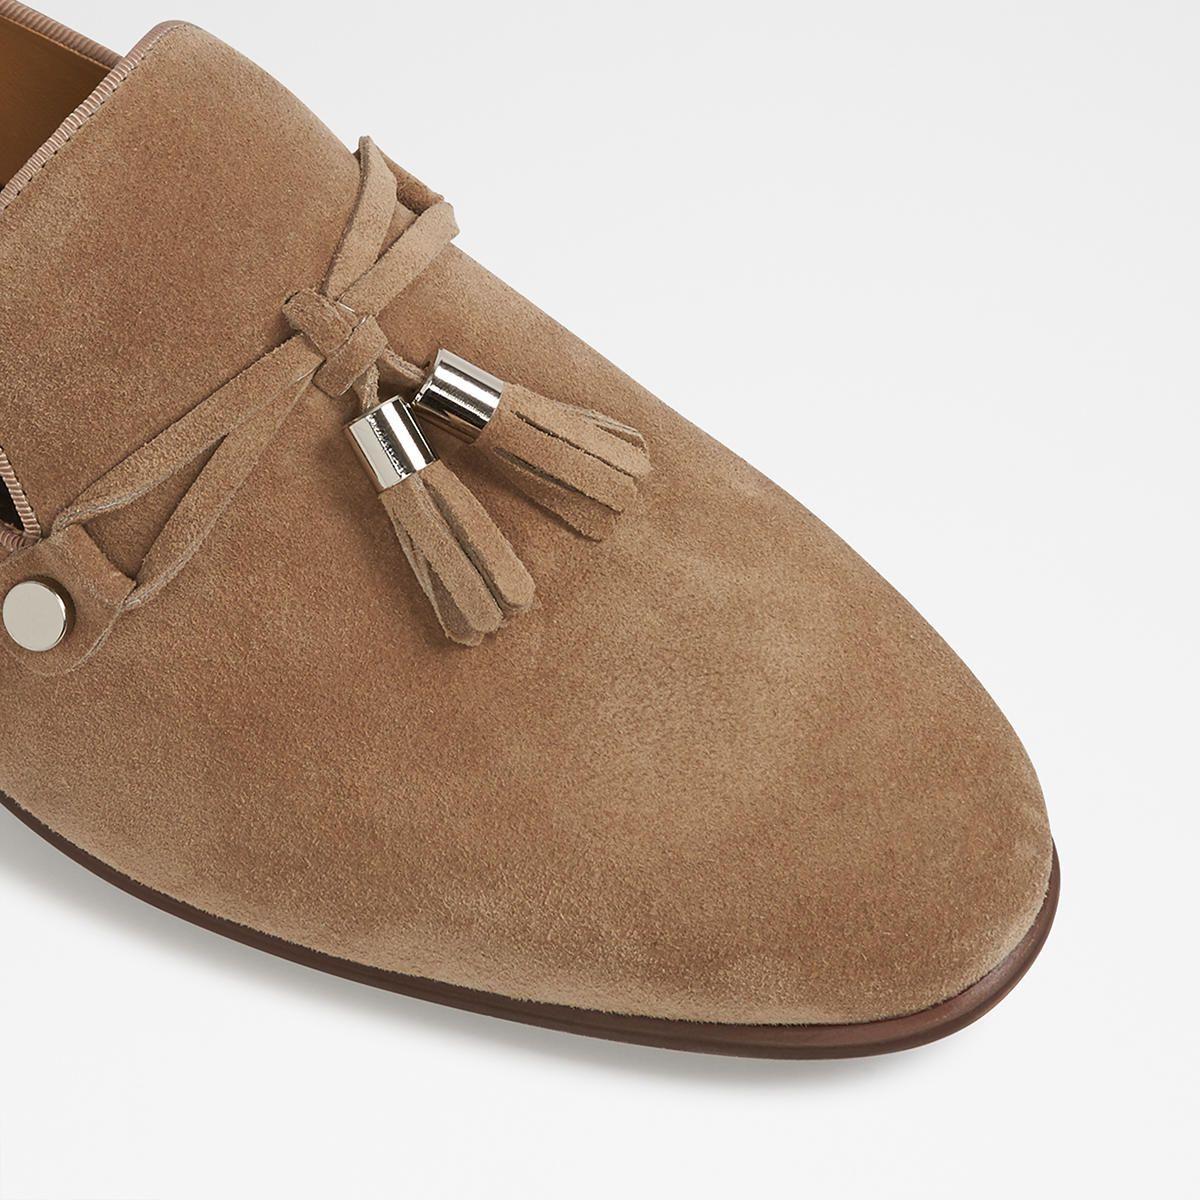 16b0254f4e097 Mccrery | Sartorial Seduction | Shoes, Loafers men, Dress shoes